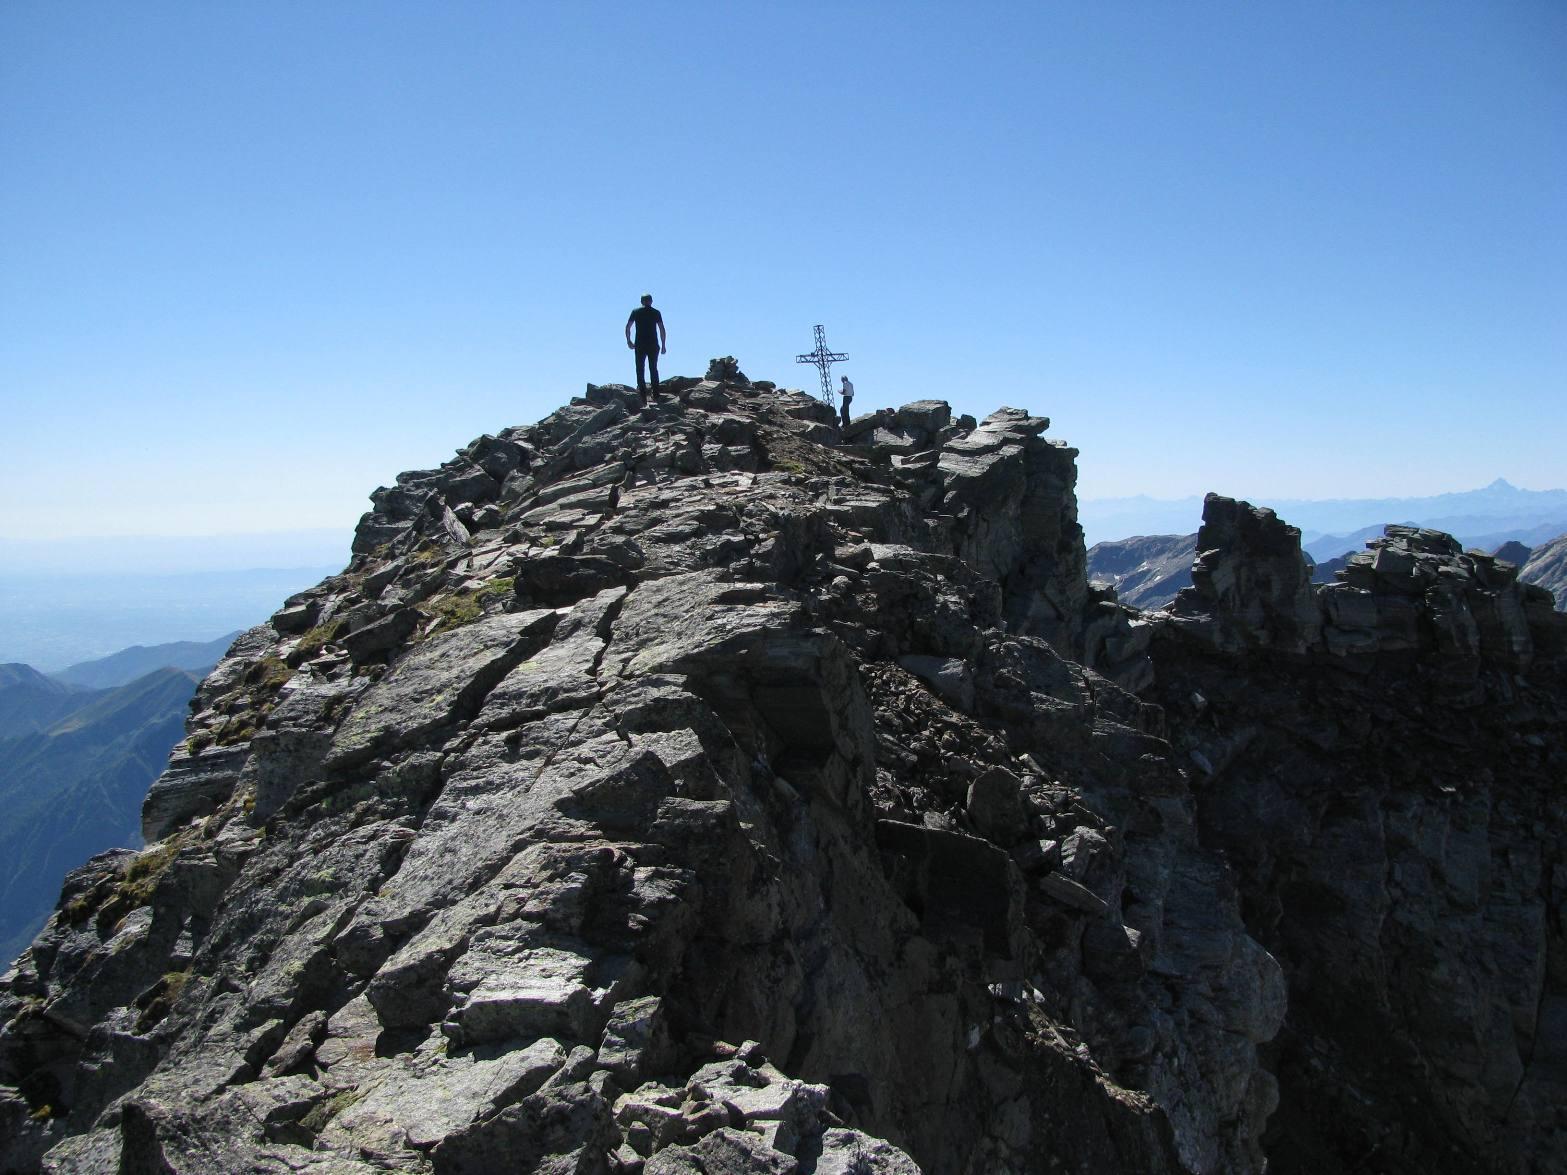 Passeggiata in cresta